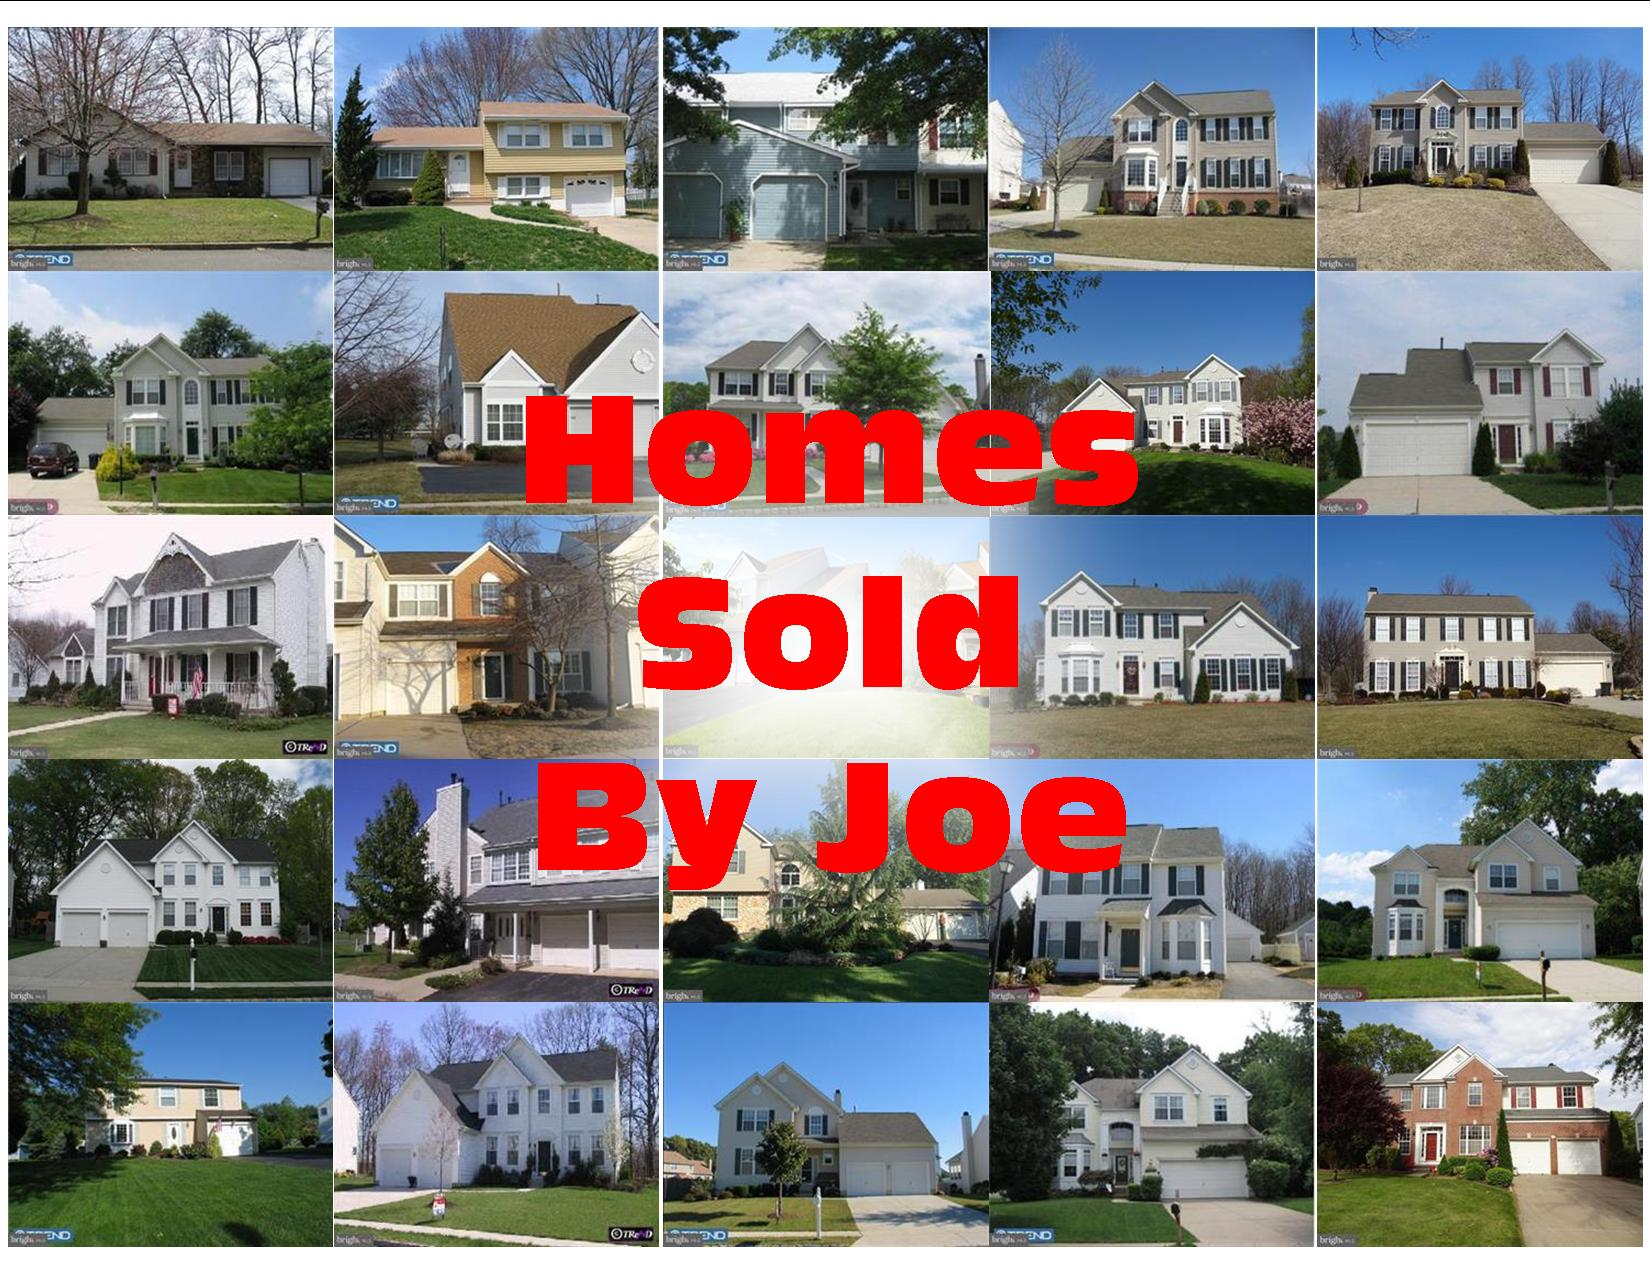 Homes Sold By Joe